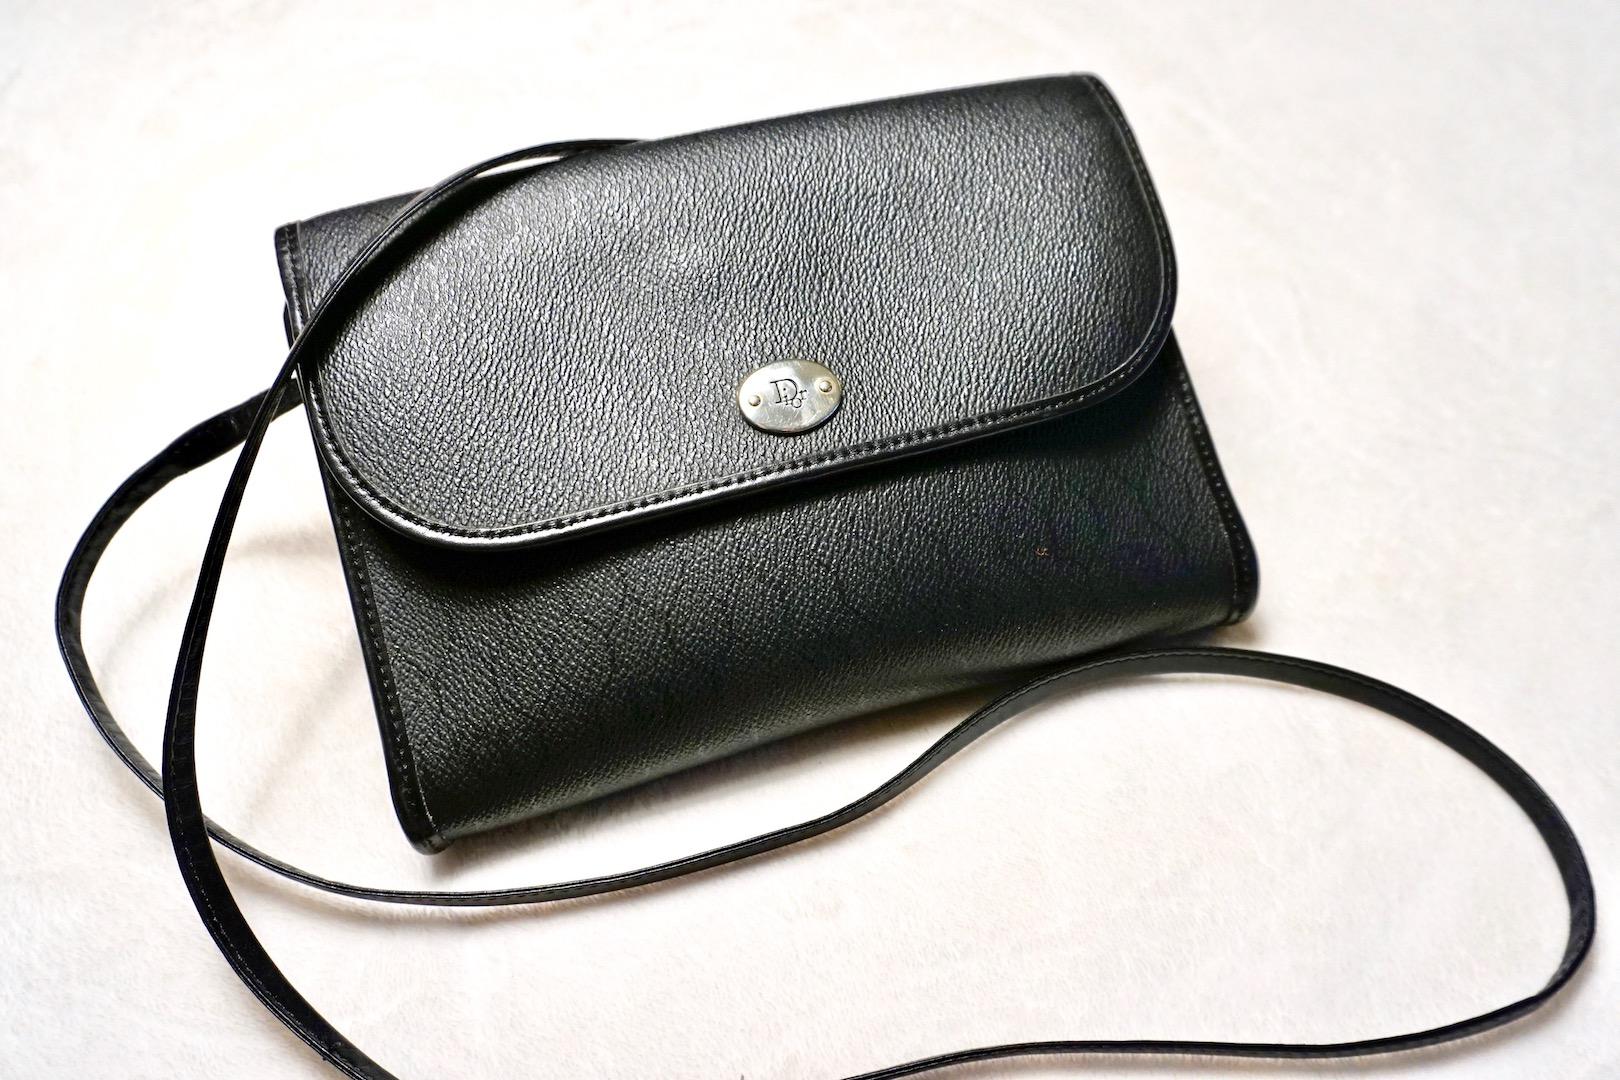 aa36602e6 Christian Dior Vintage Black Crossbody Bag - Luxurylana Boutique